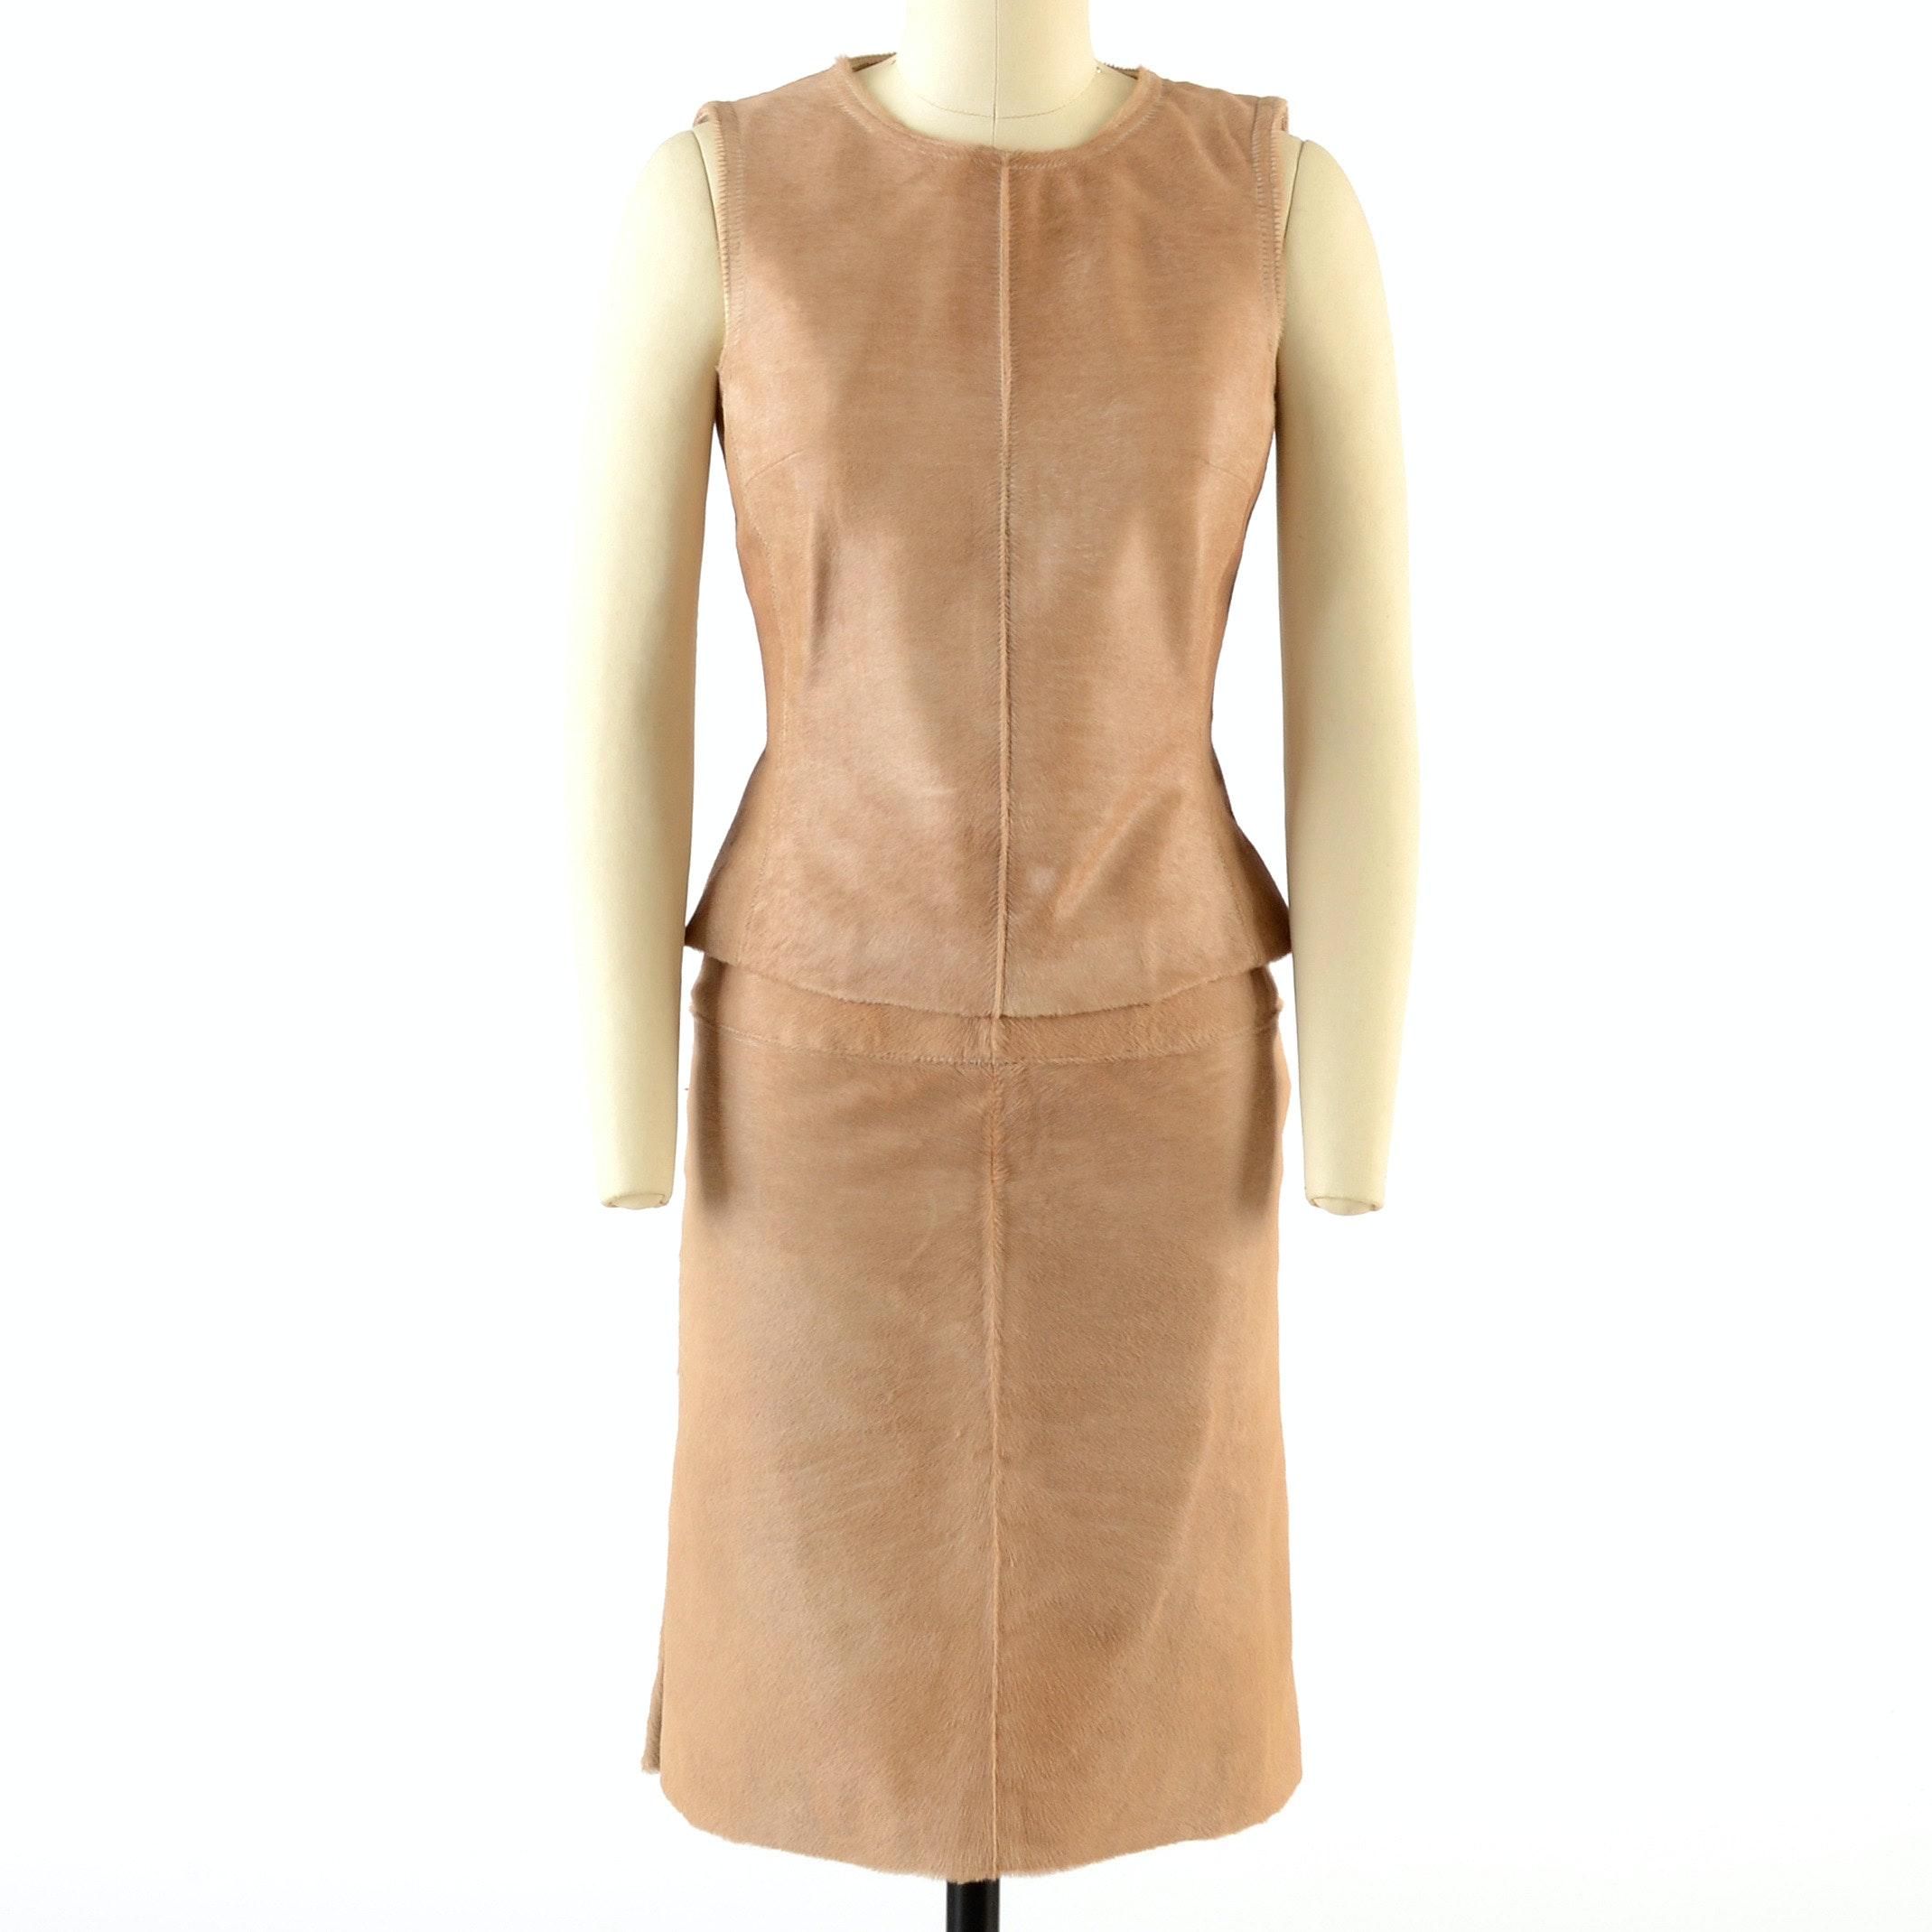 J. Mendel of Paris Ponyskin Leather Sleeveless Top and Matching Skirt